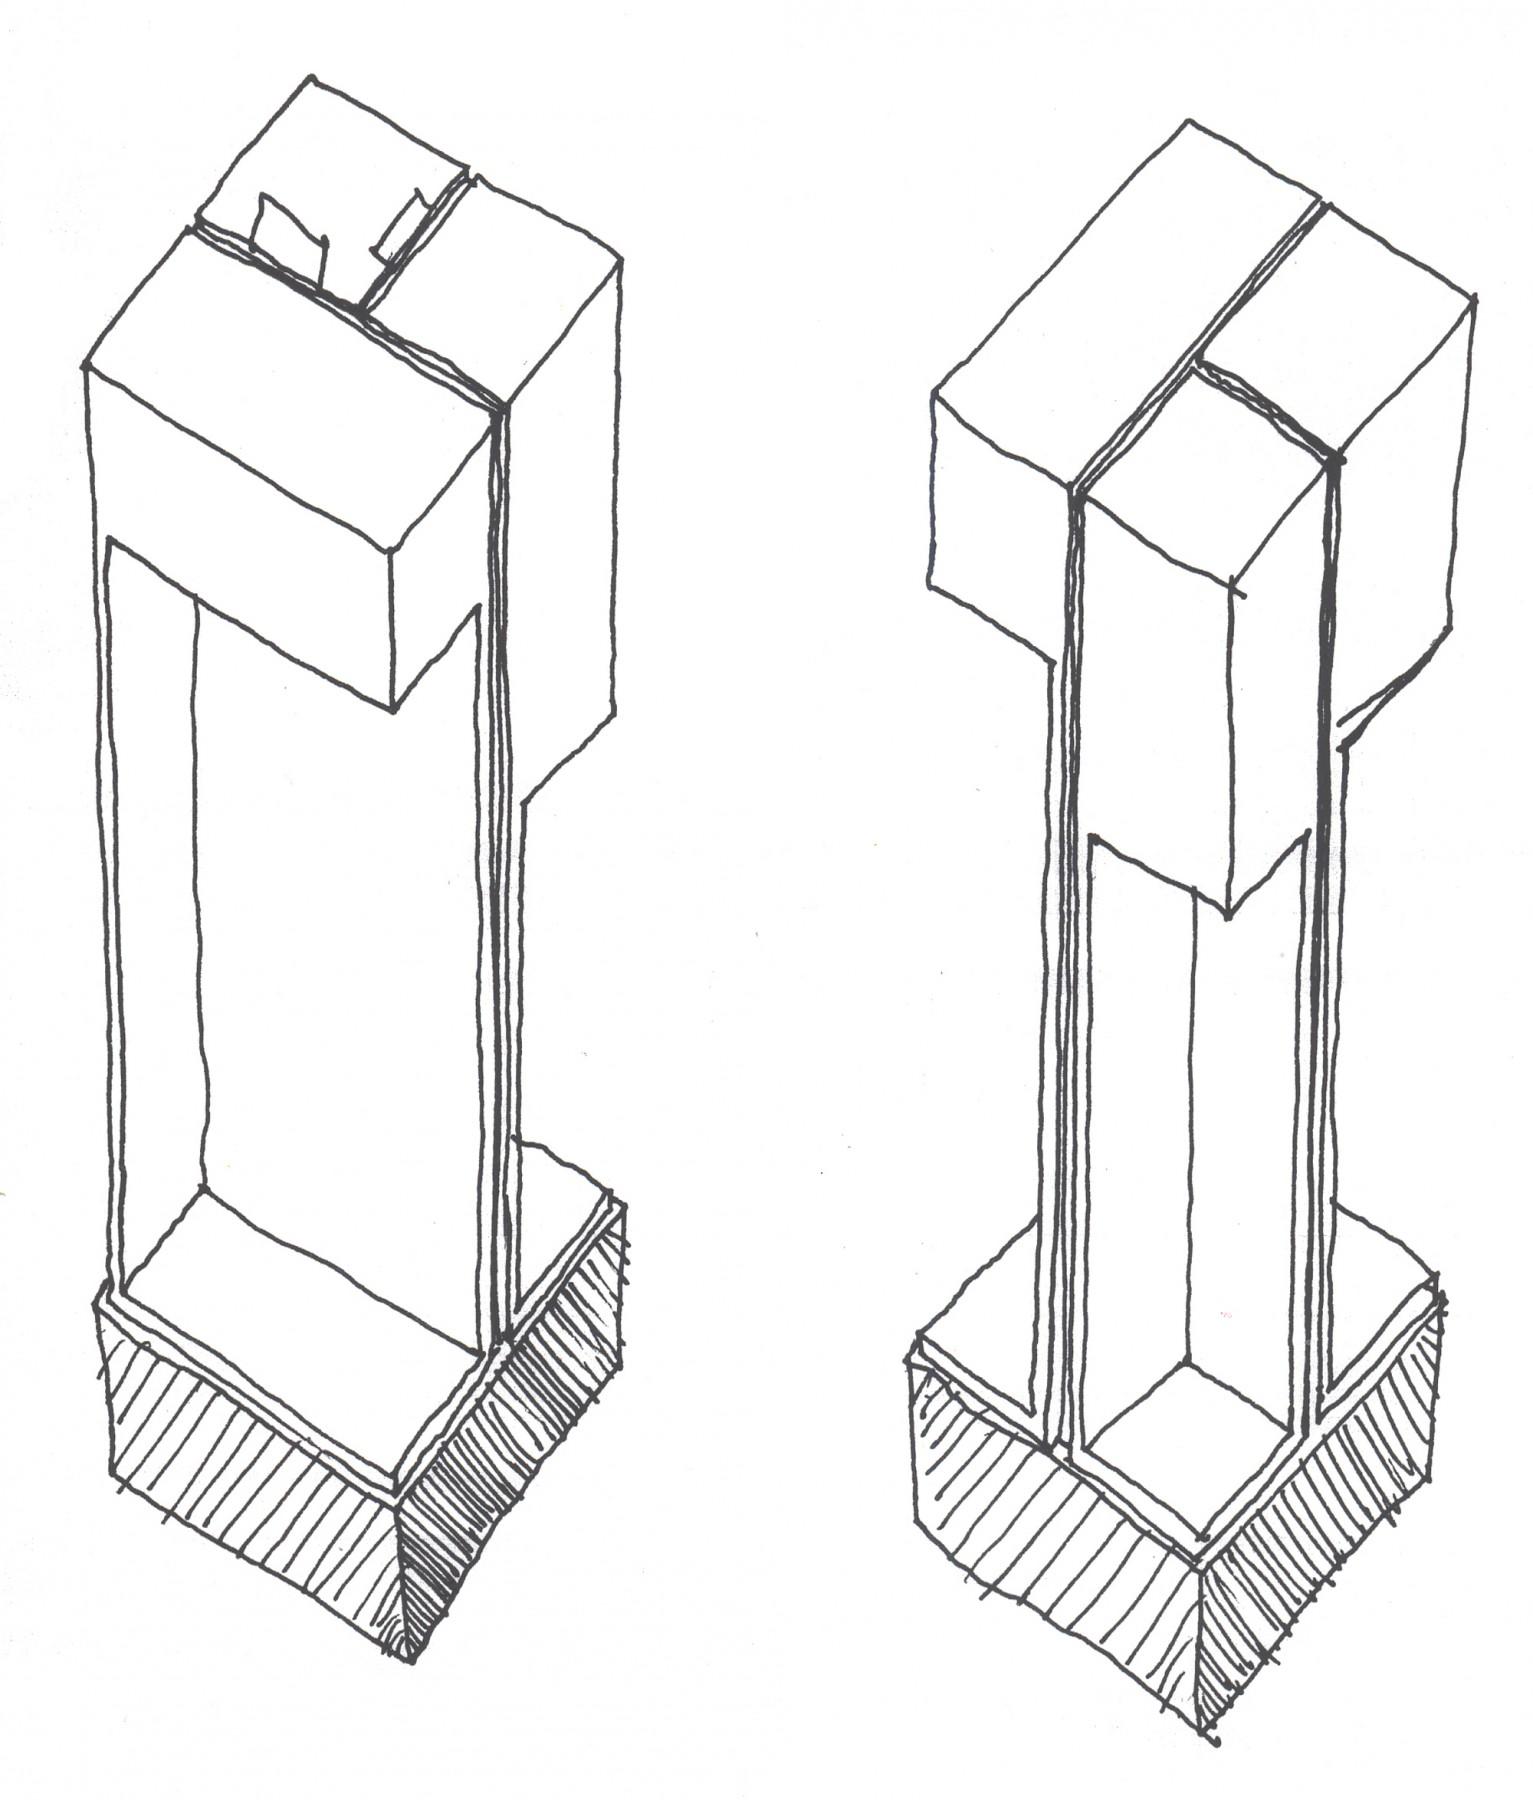 Selfridges-London-designer-fashion-retail-Jamie-Fobert-Architects-shoe-galleries-alabaster-plinths-sketches